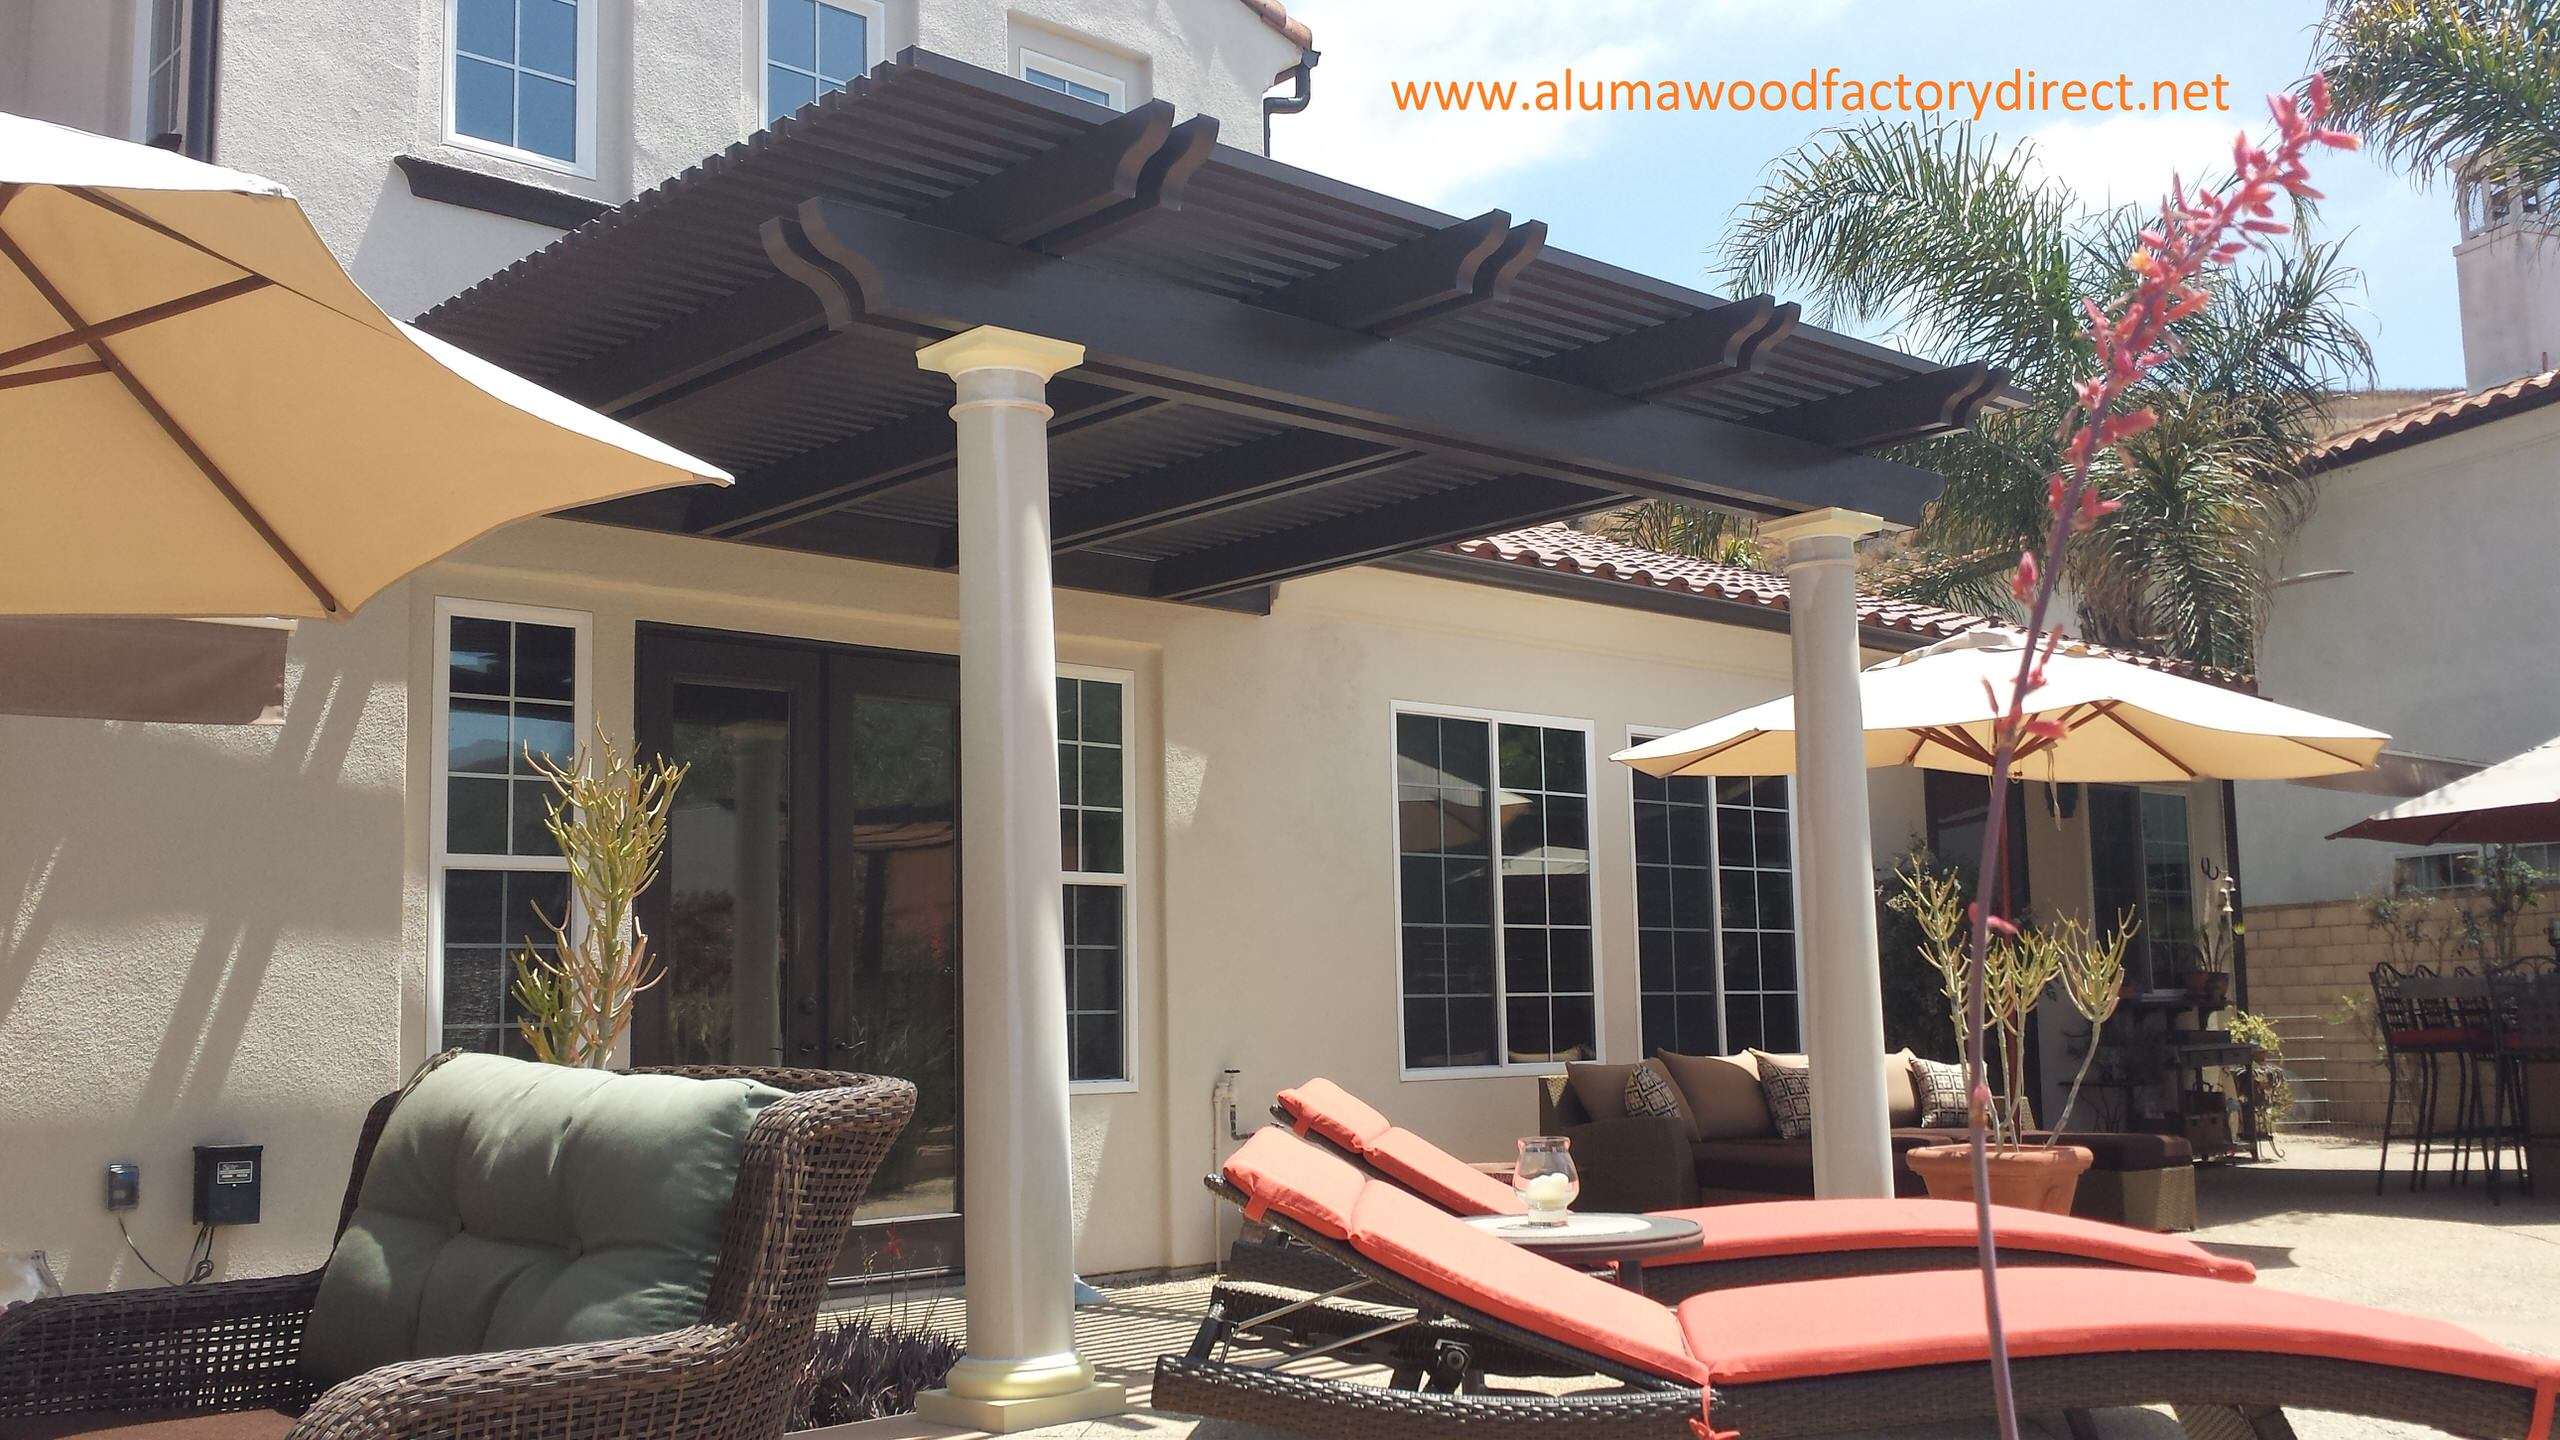 alumawood patio covers houzz